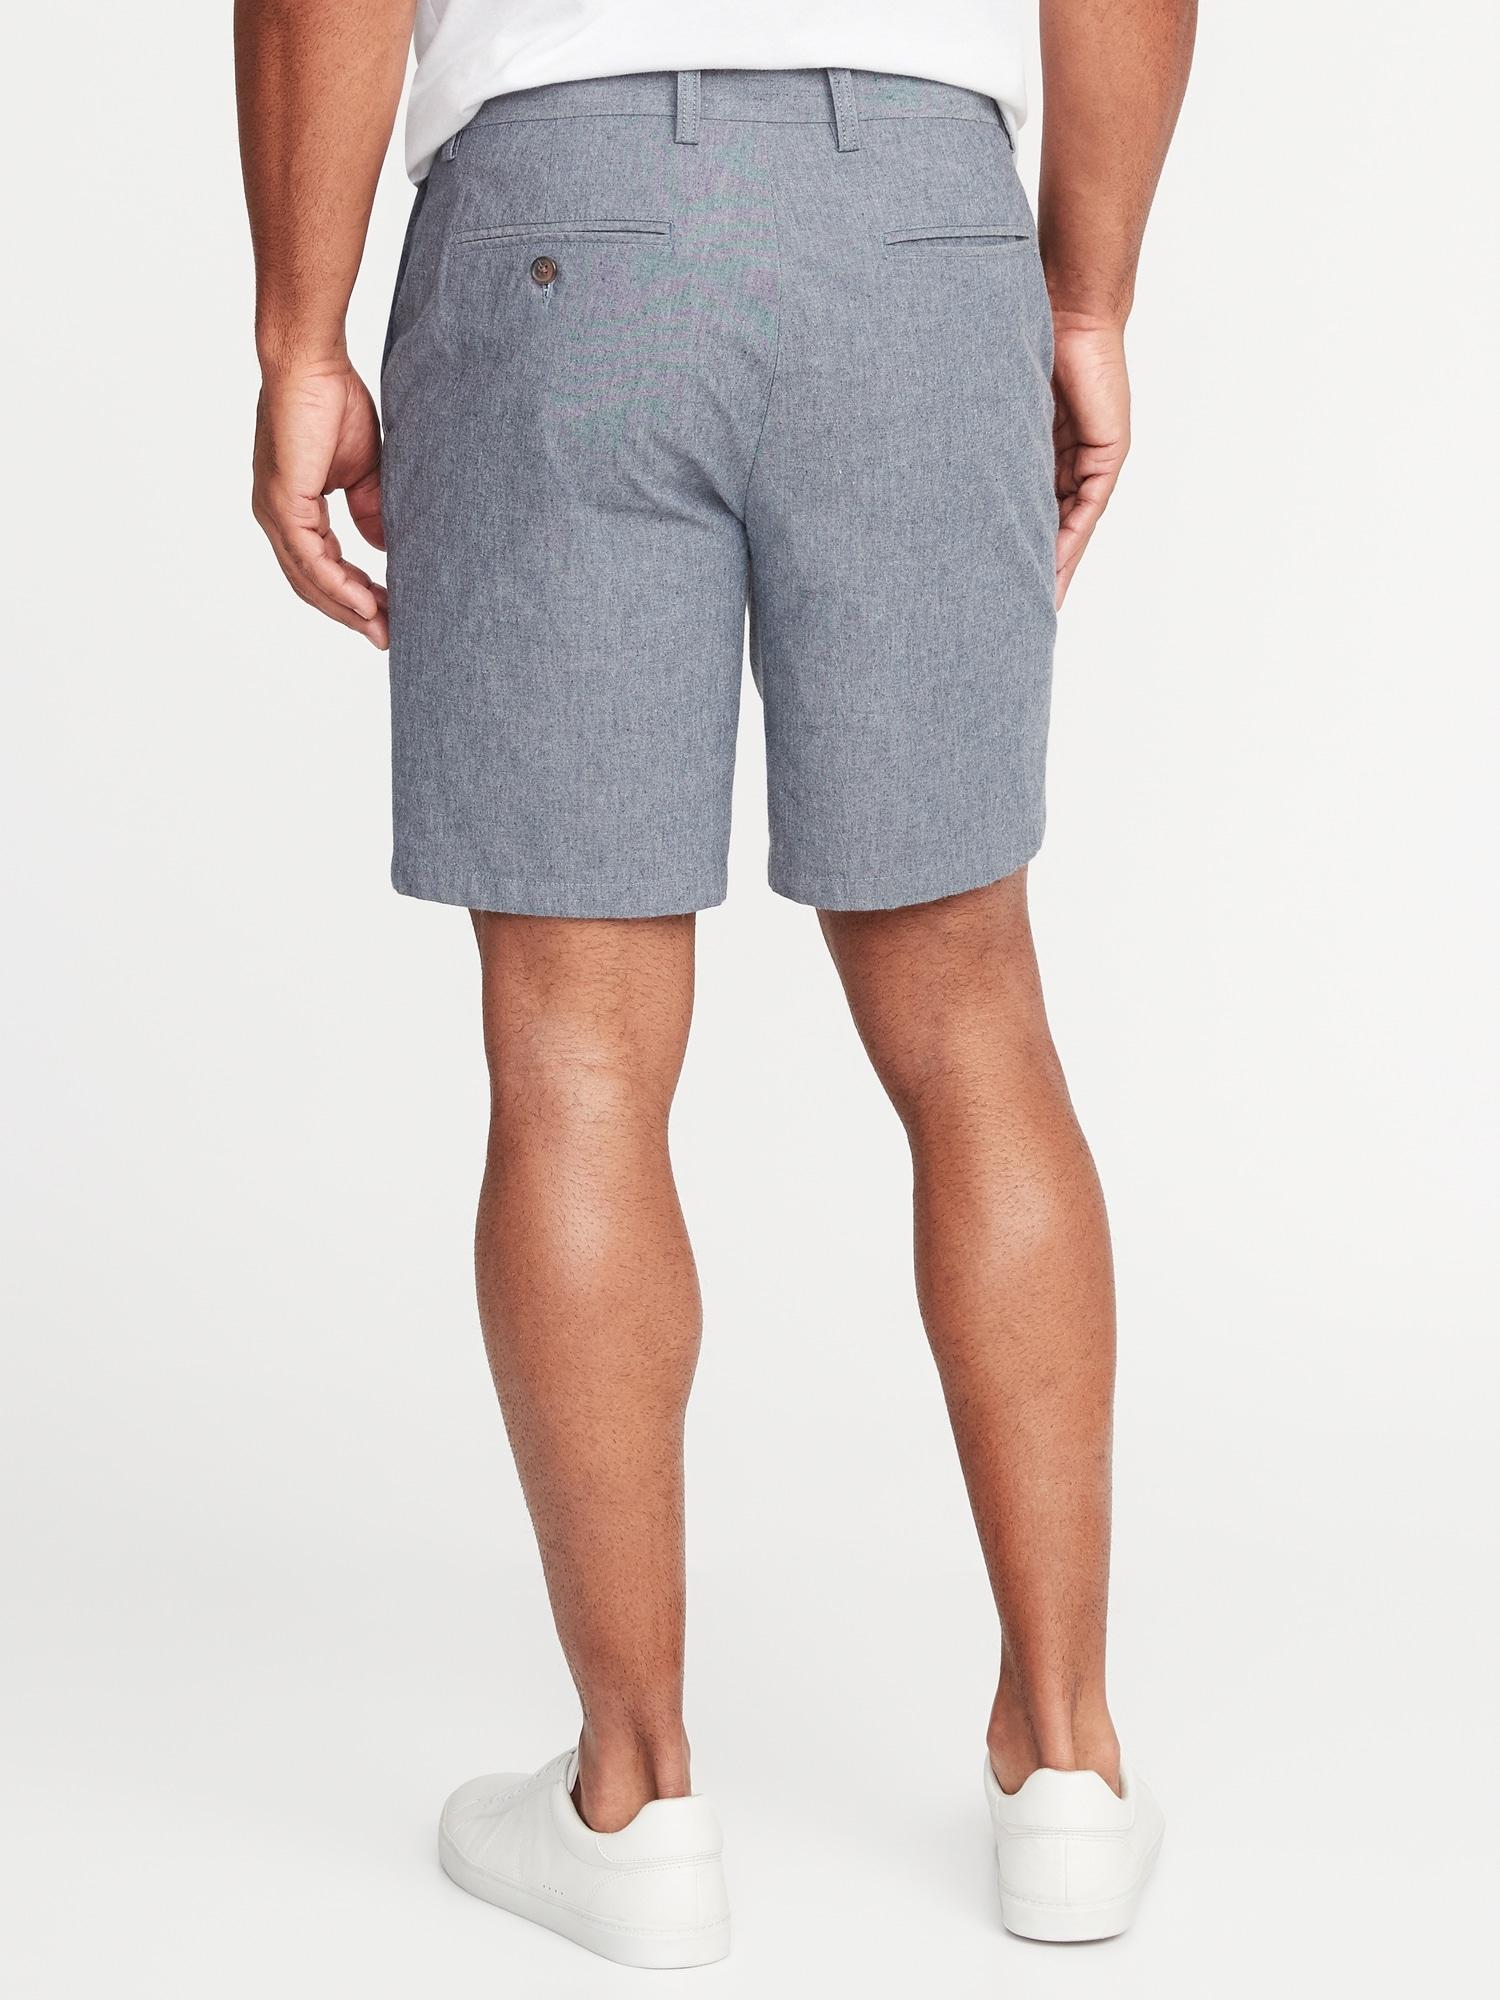 3f2c5140b53 Ultimate Slim Built-In Flex Chambray Shorts for Men - 8-inch inseam ...